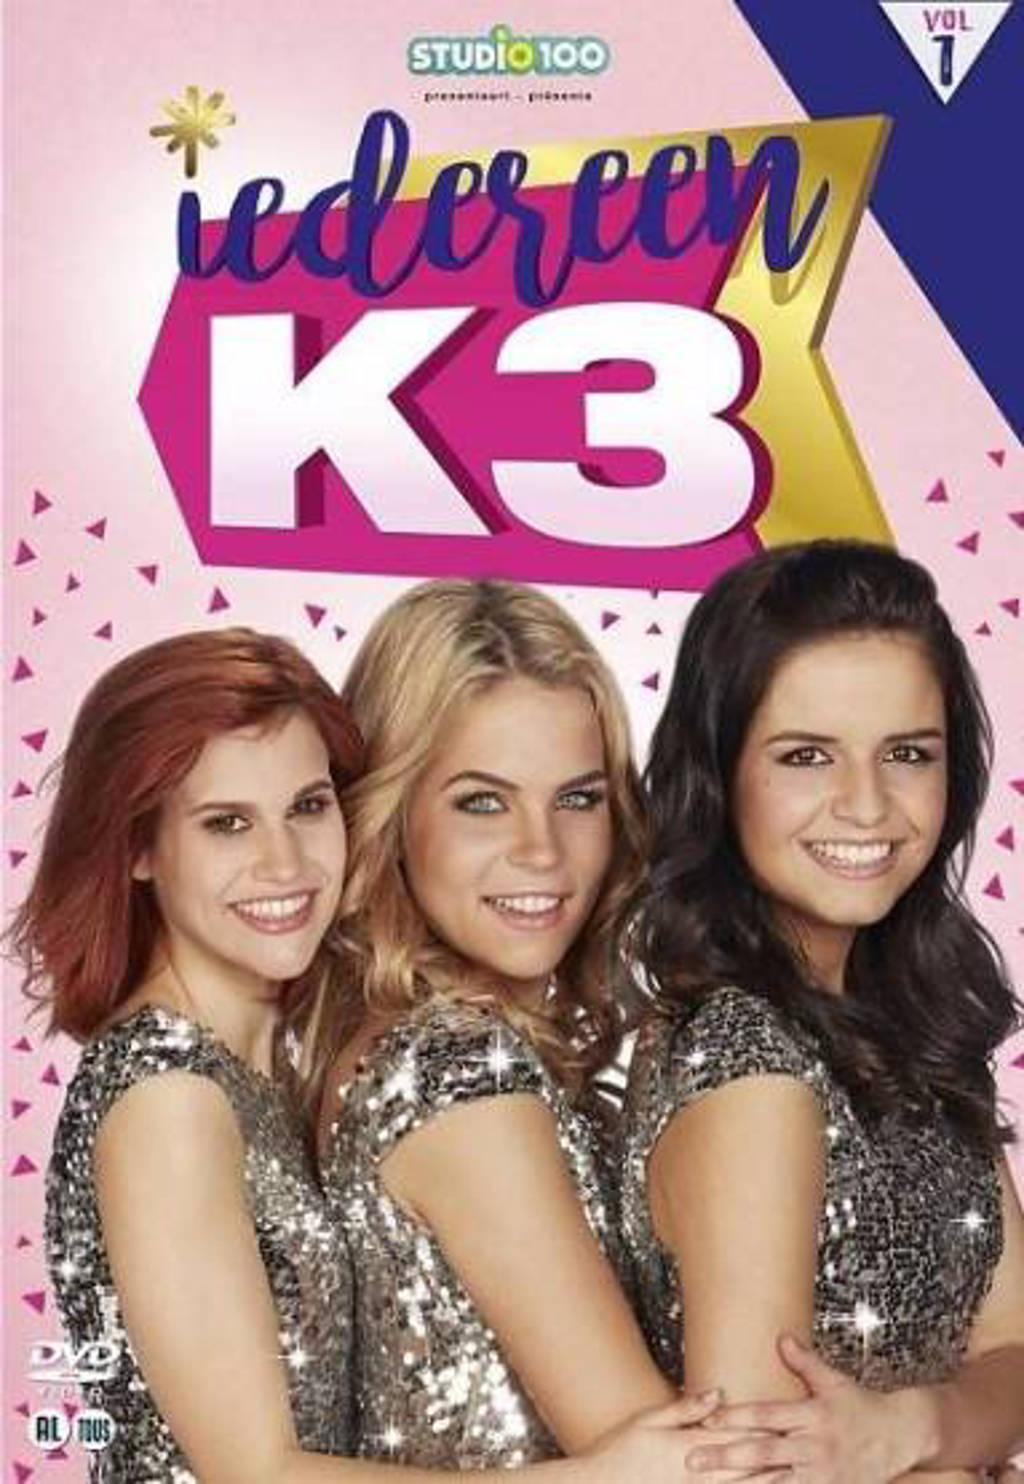 K3 - Iedereen K3 volume 1 (DVD)